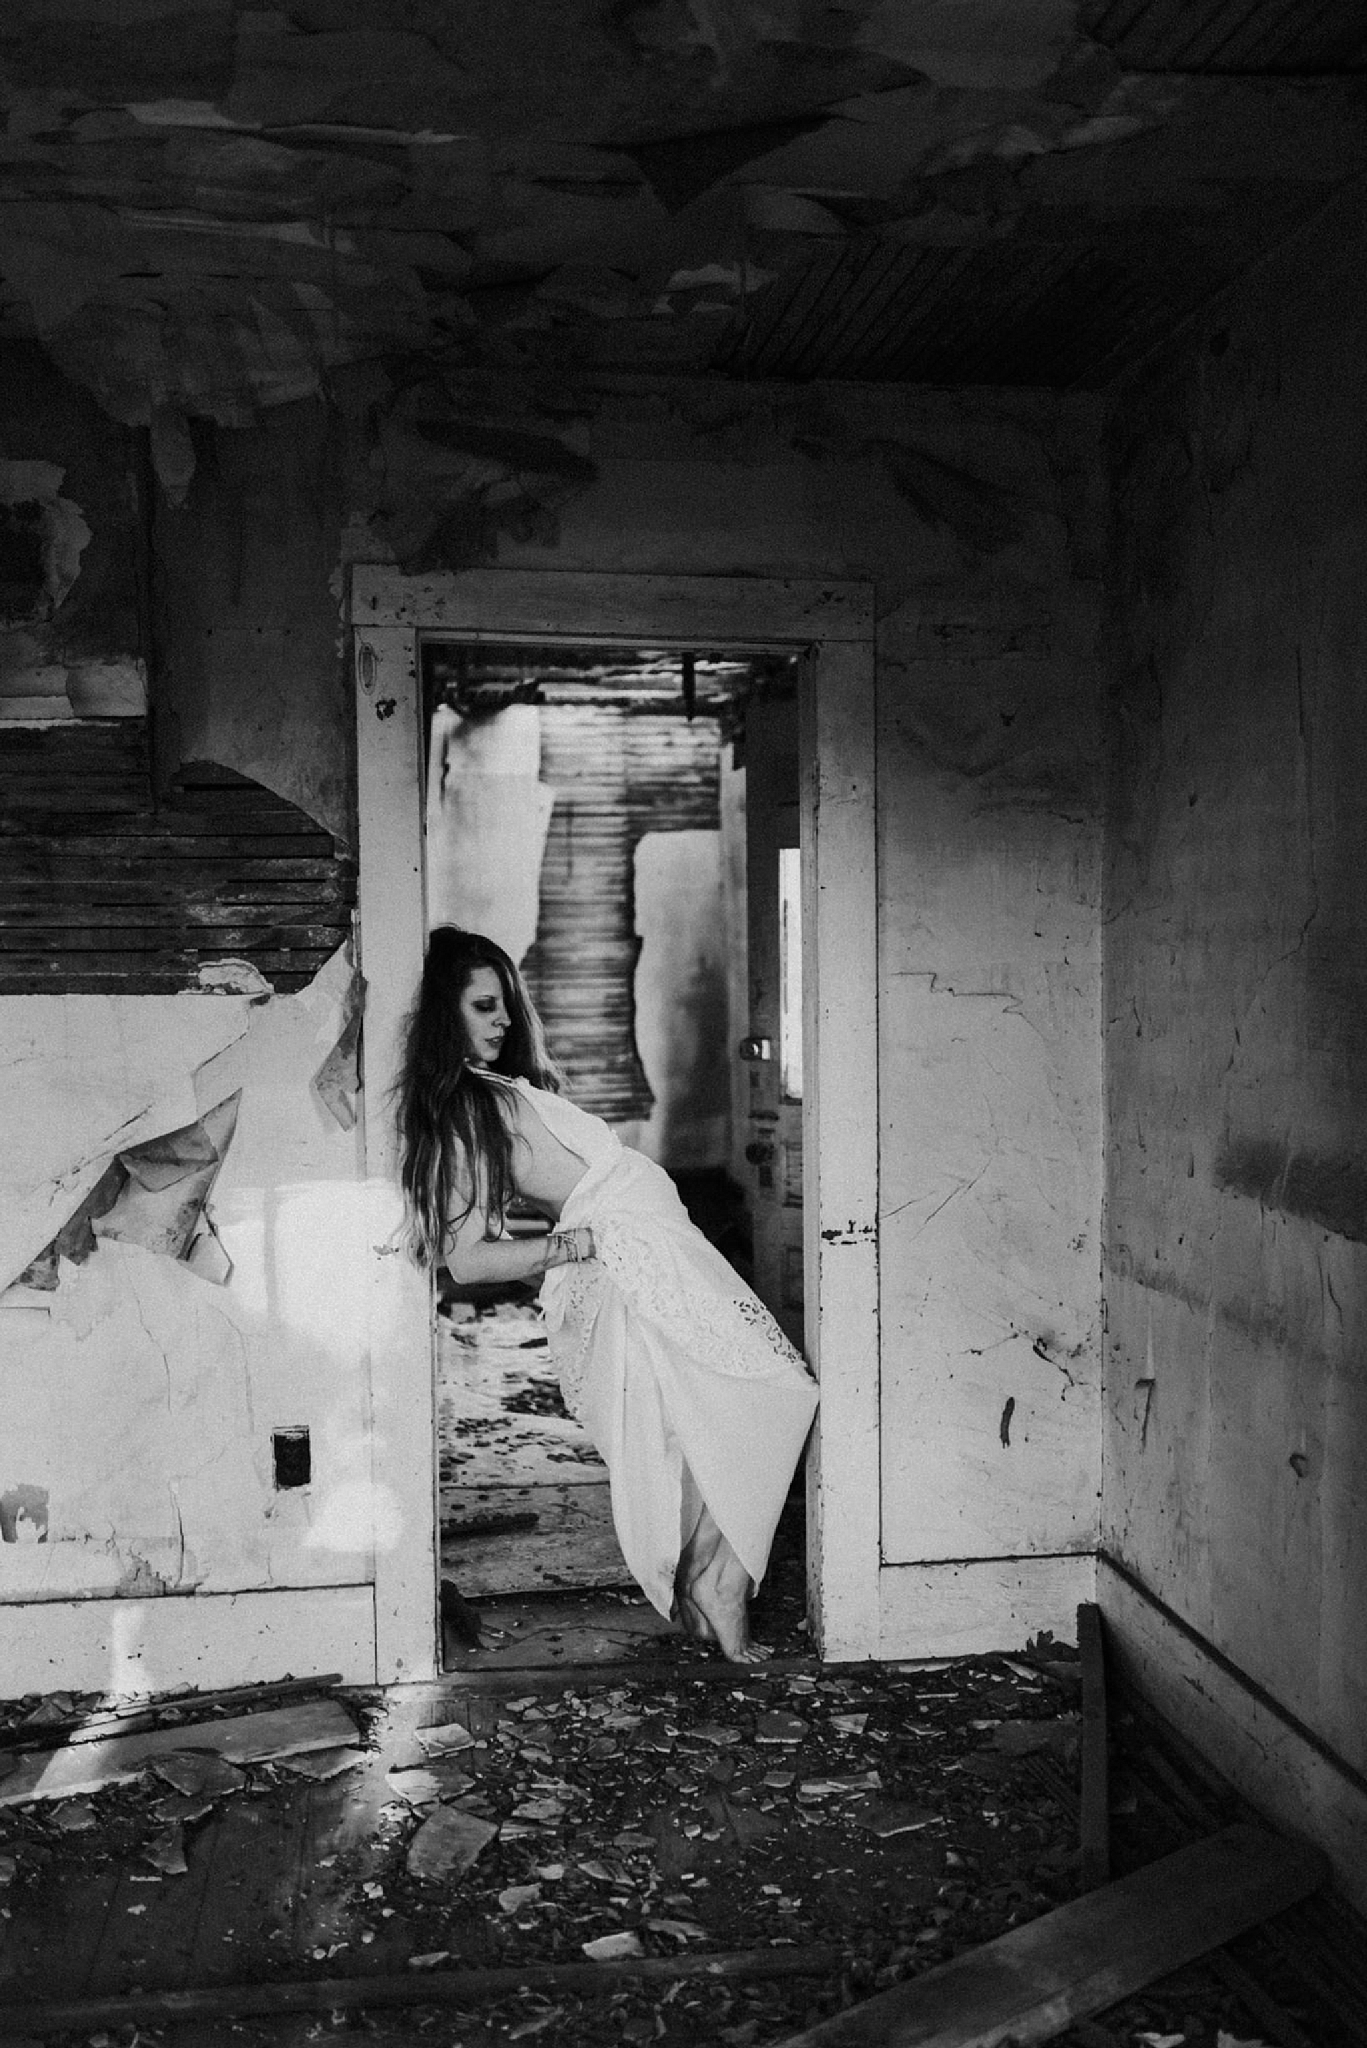 twyla jones photography - west palm beach florida photographer - boudoir in an old house-5054_treasure coast florida.jpg